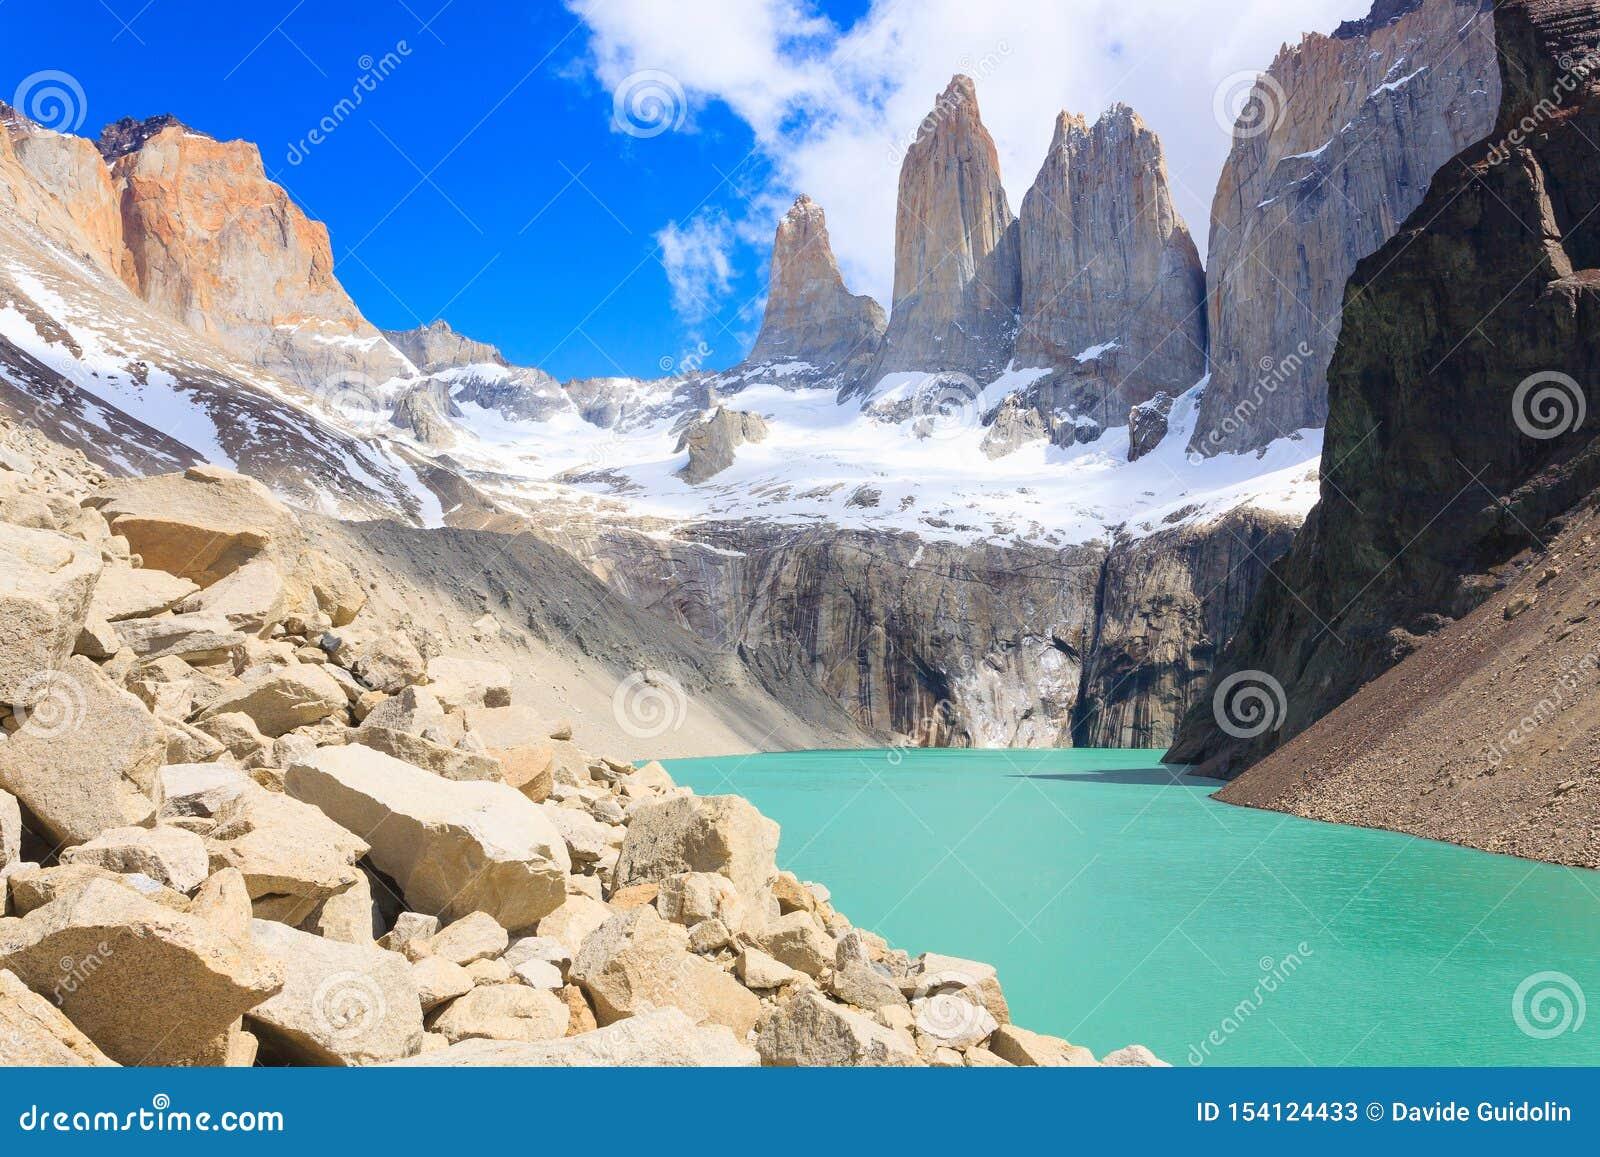 Vue de Torres del Paine, point de vue bas de Las Torres, Chili